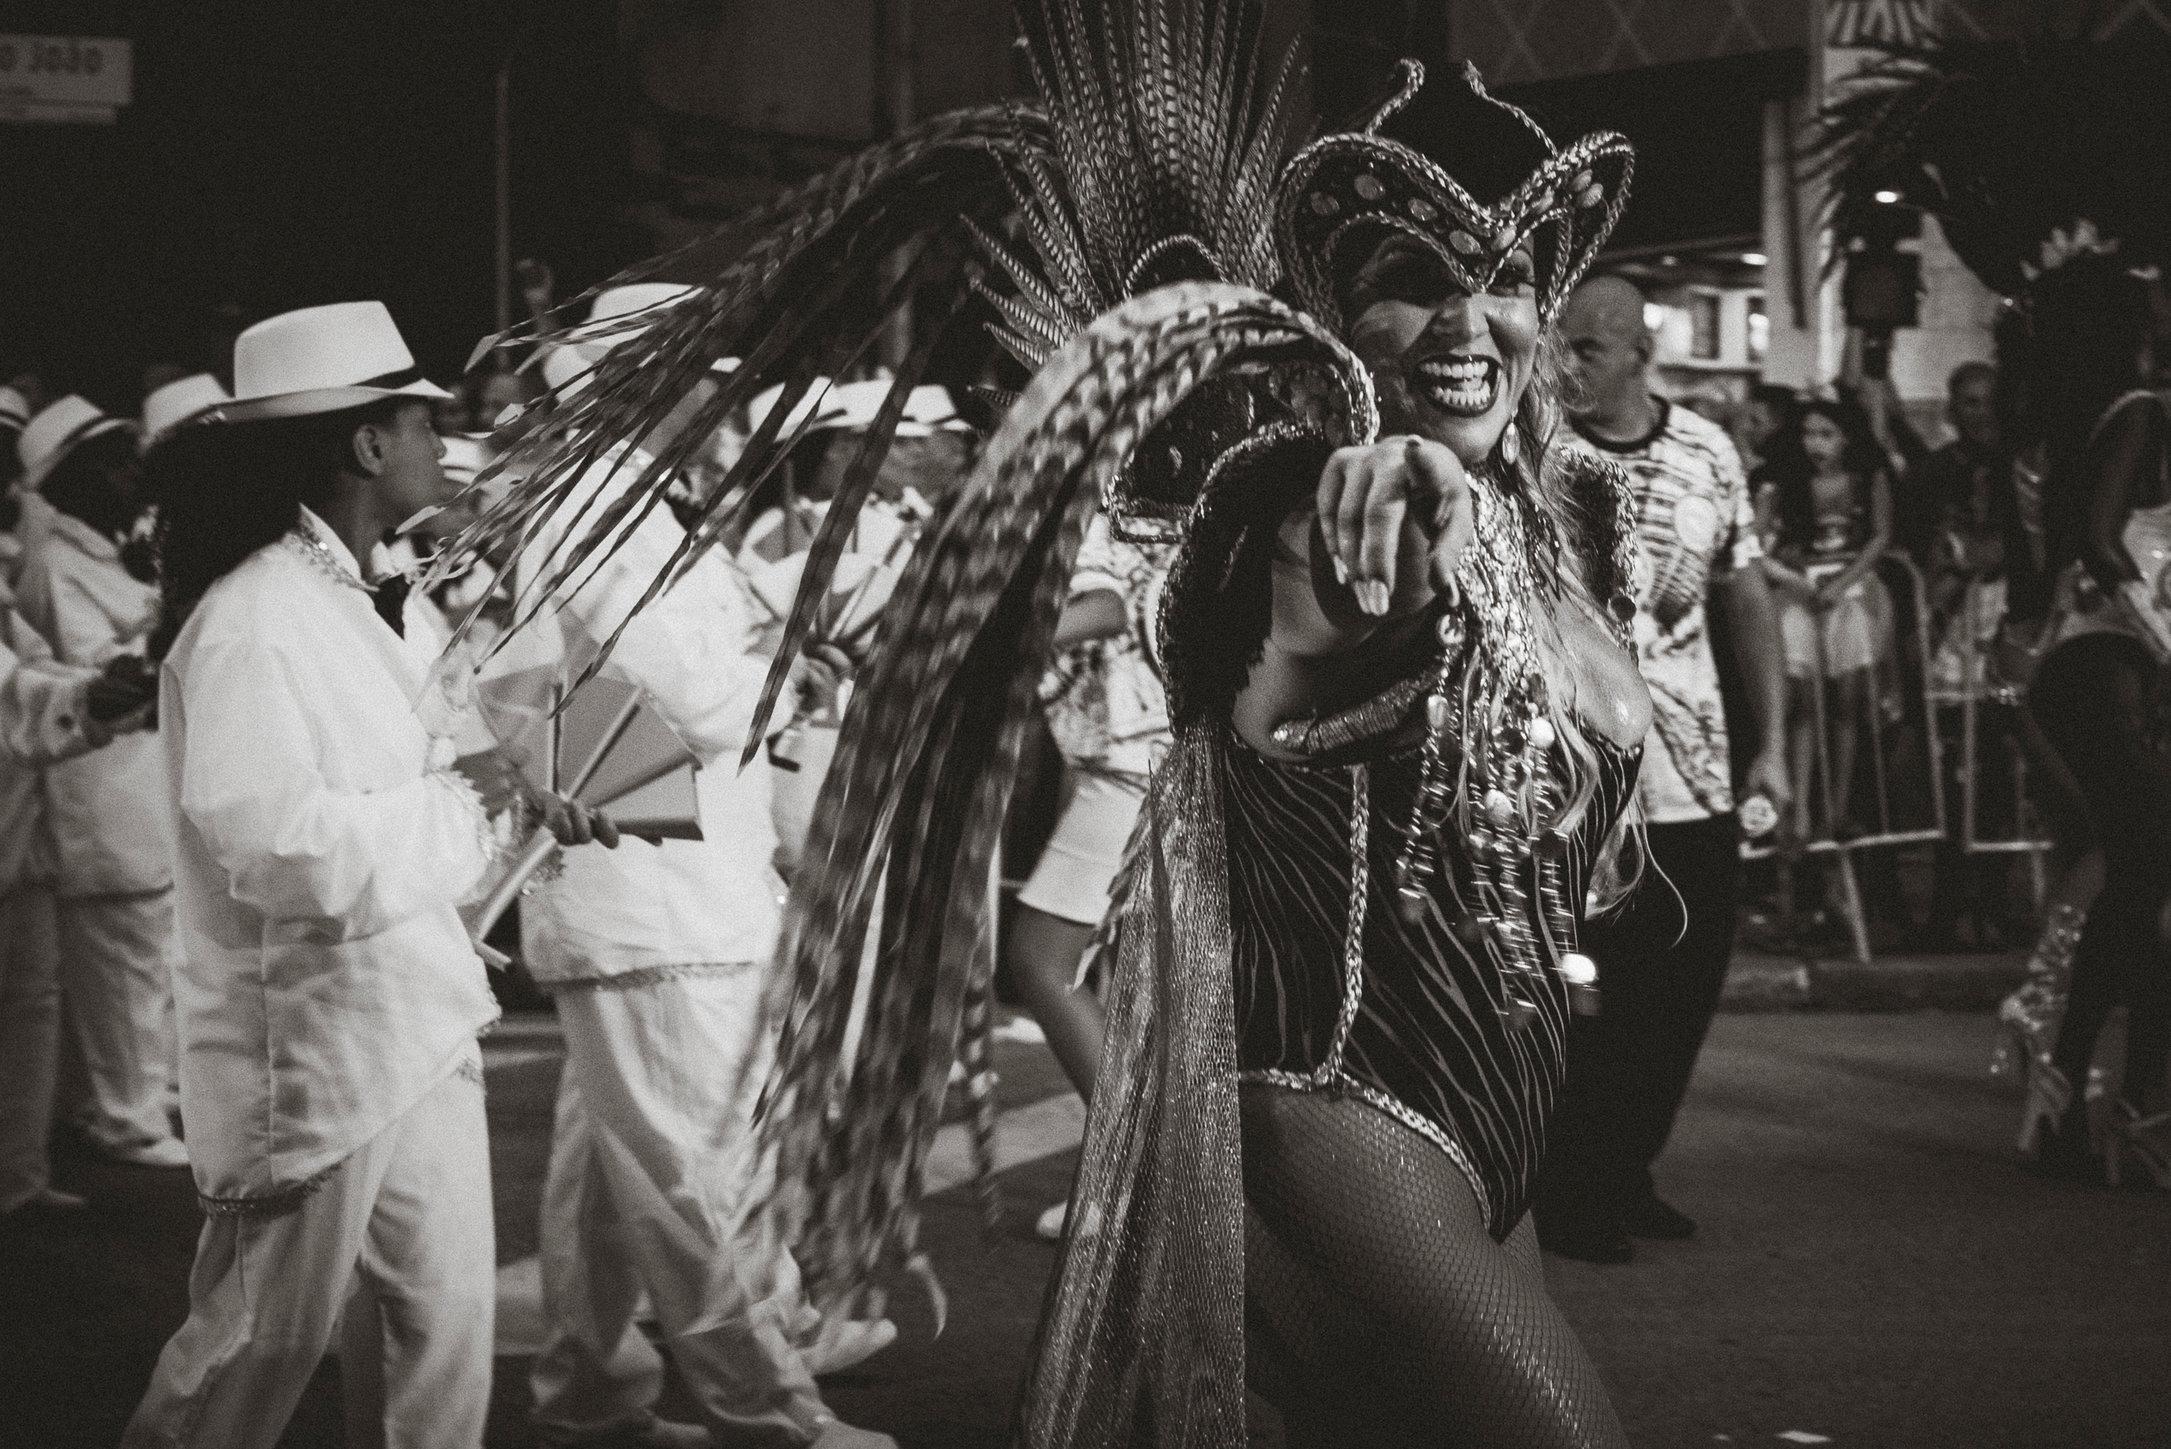 20180211-Carnaval-71.jpg